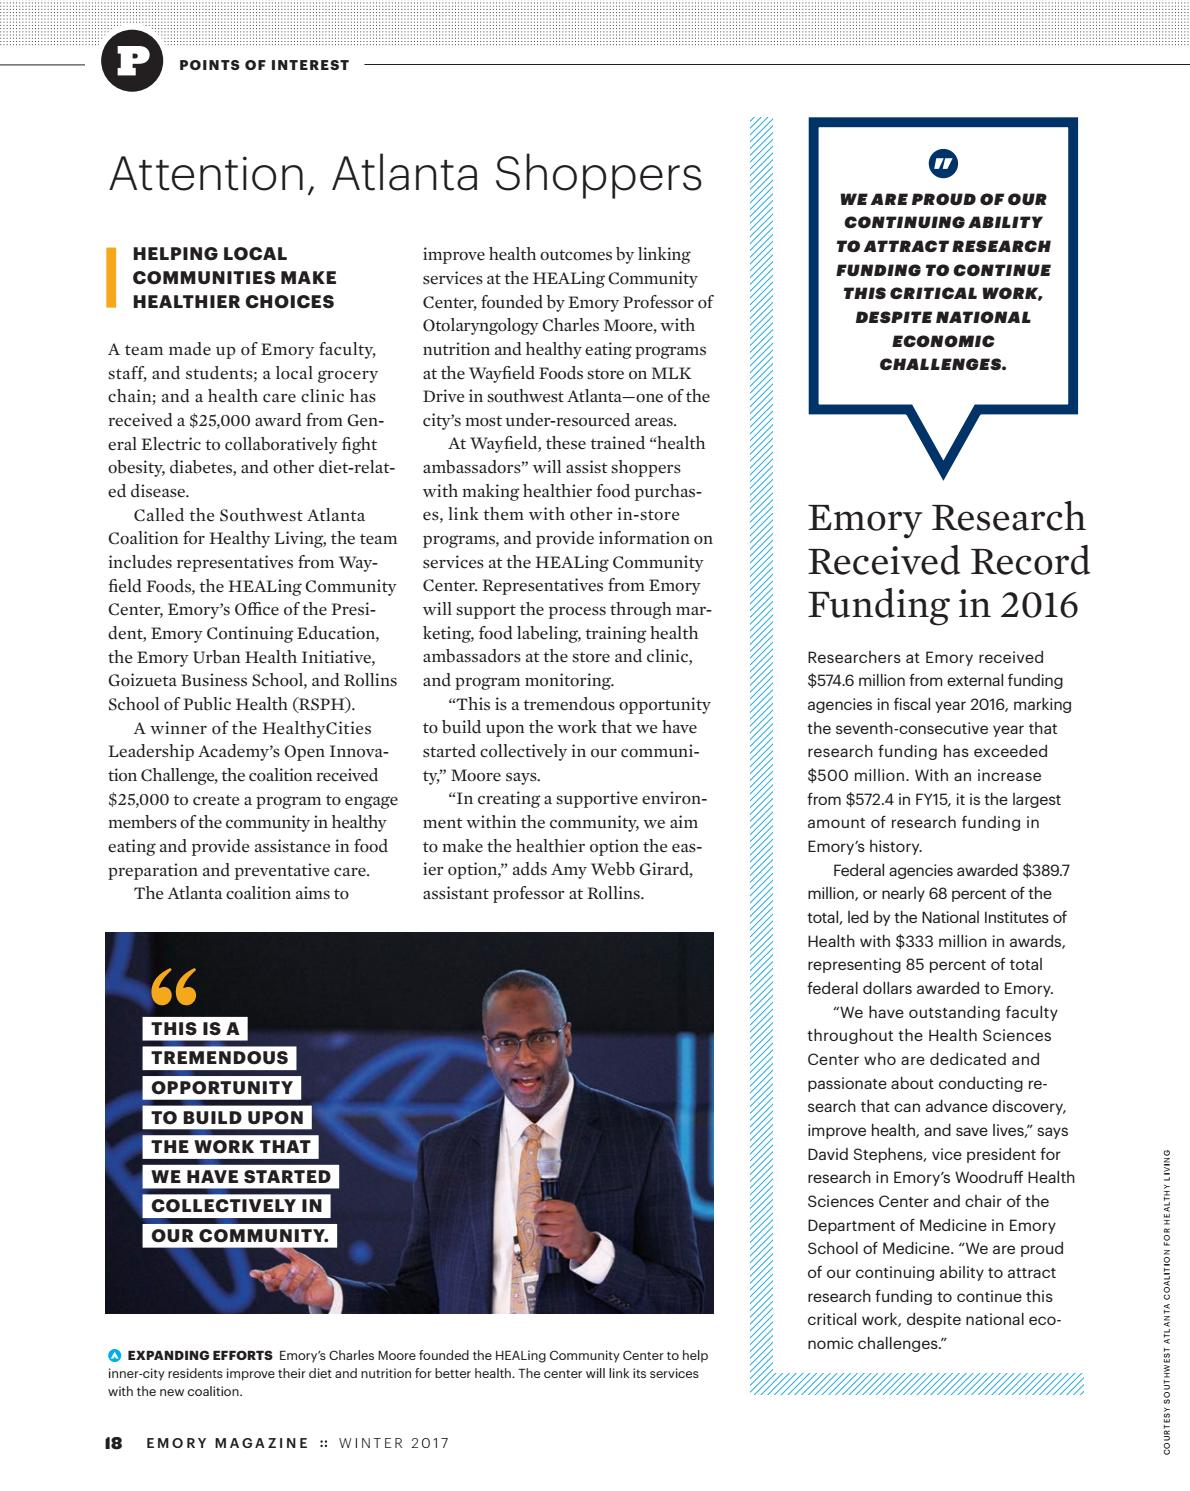 Emory Magazine / Winter 2017 by Emory University - issuu